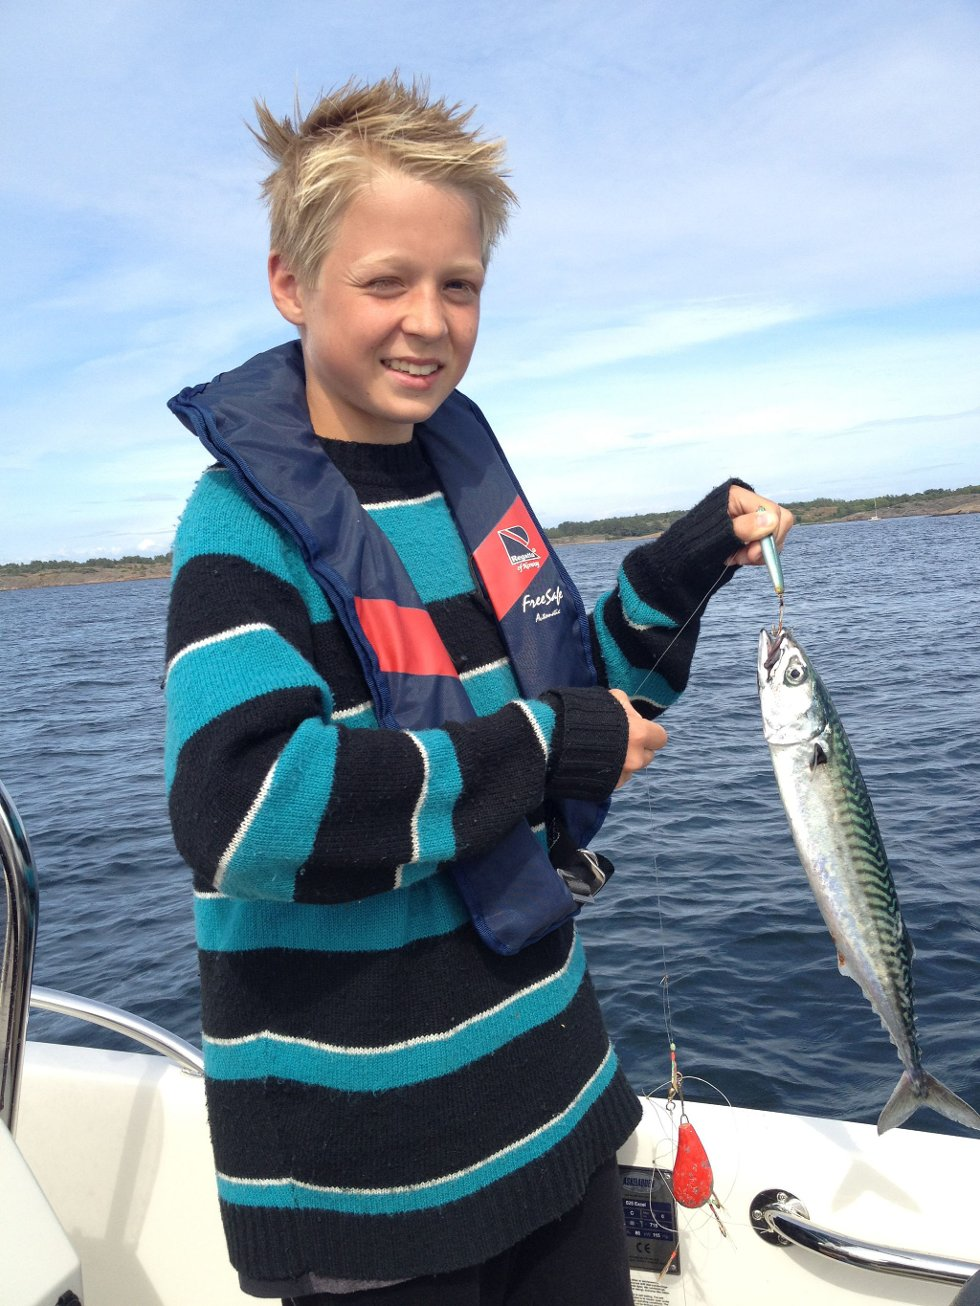 MAKRELLSOMMER: John-Emil Gimnes Wethal (12)   hilser fra ferieparadiset Nøtterøy til besteforeldre på Jessheim. Fangsten smakte godt på grillen!                 Foto: Karl Wethal (Foto: )